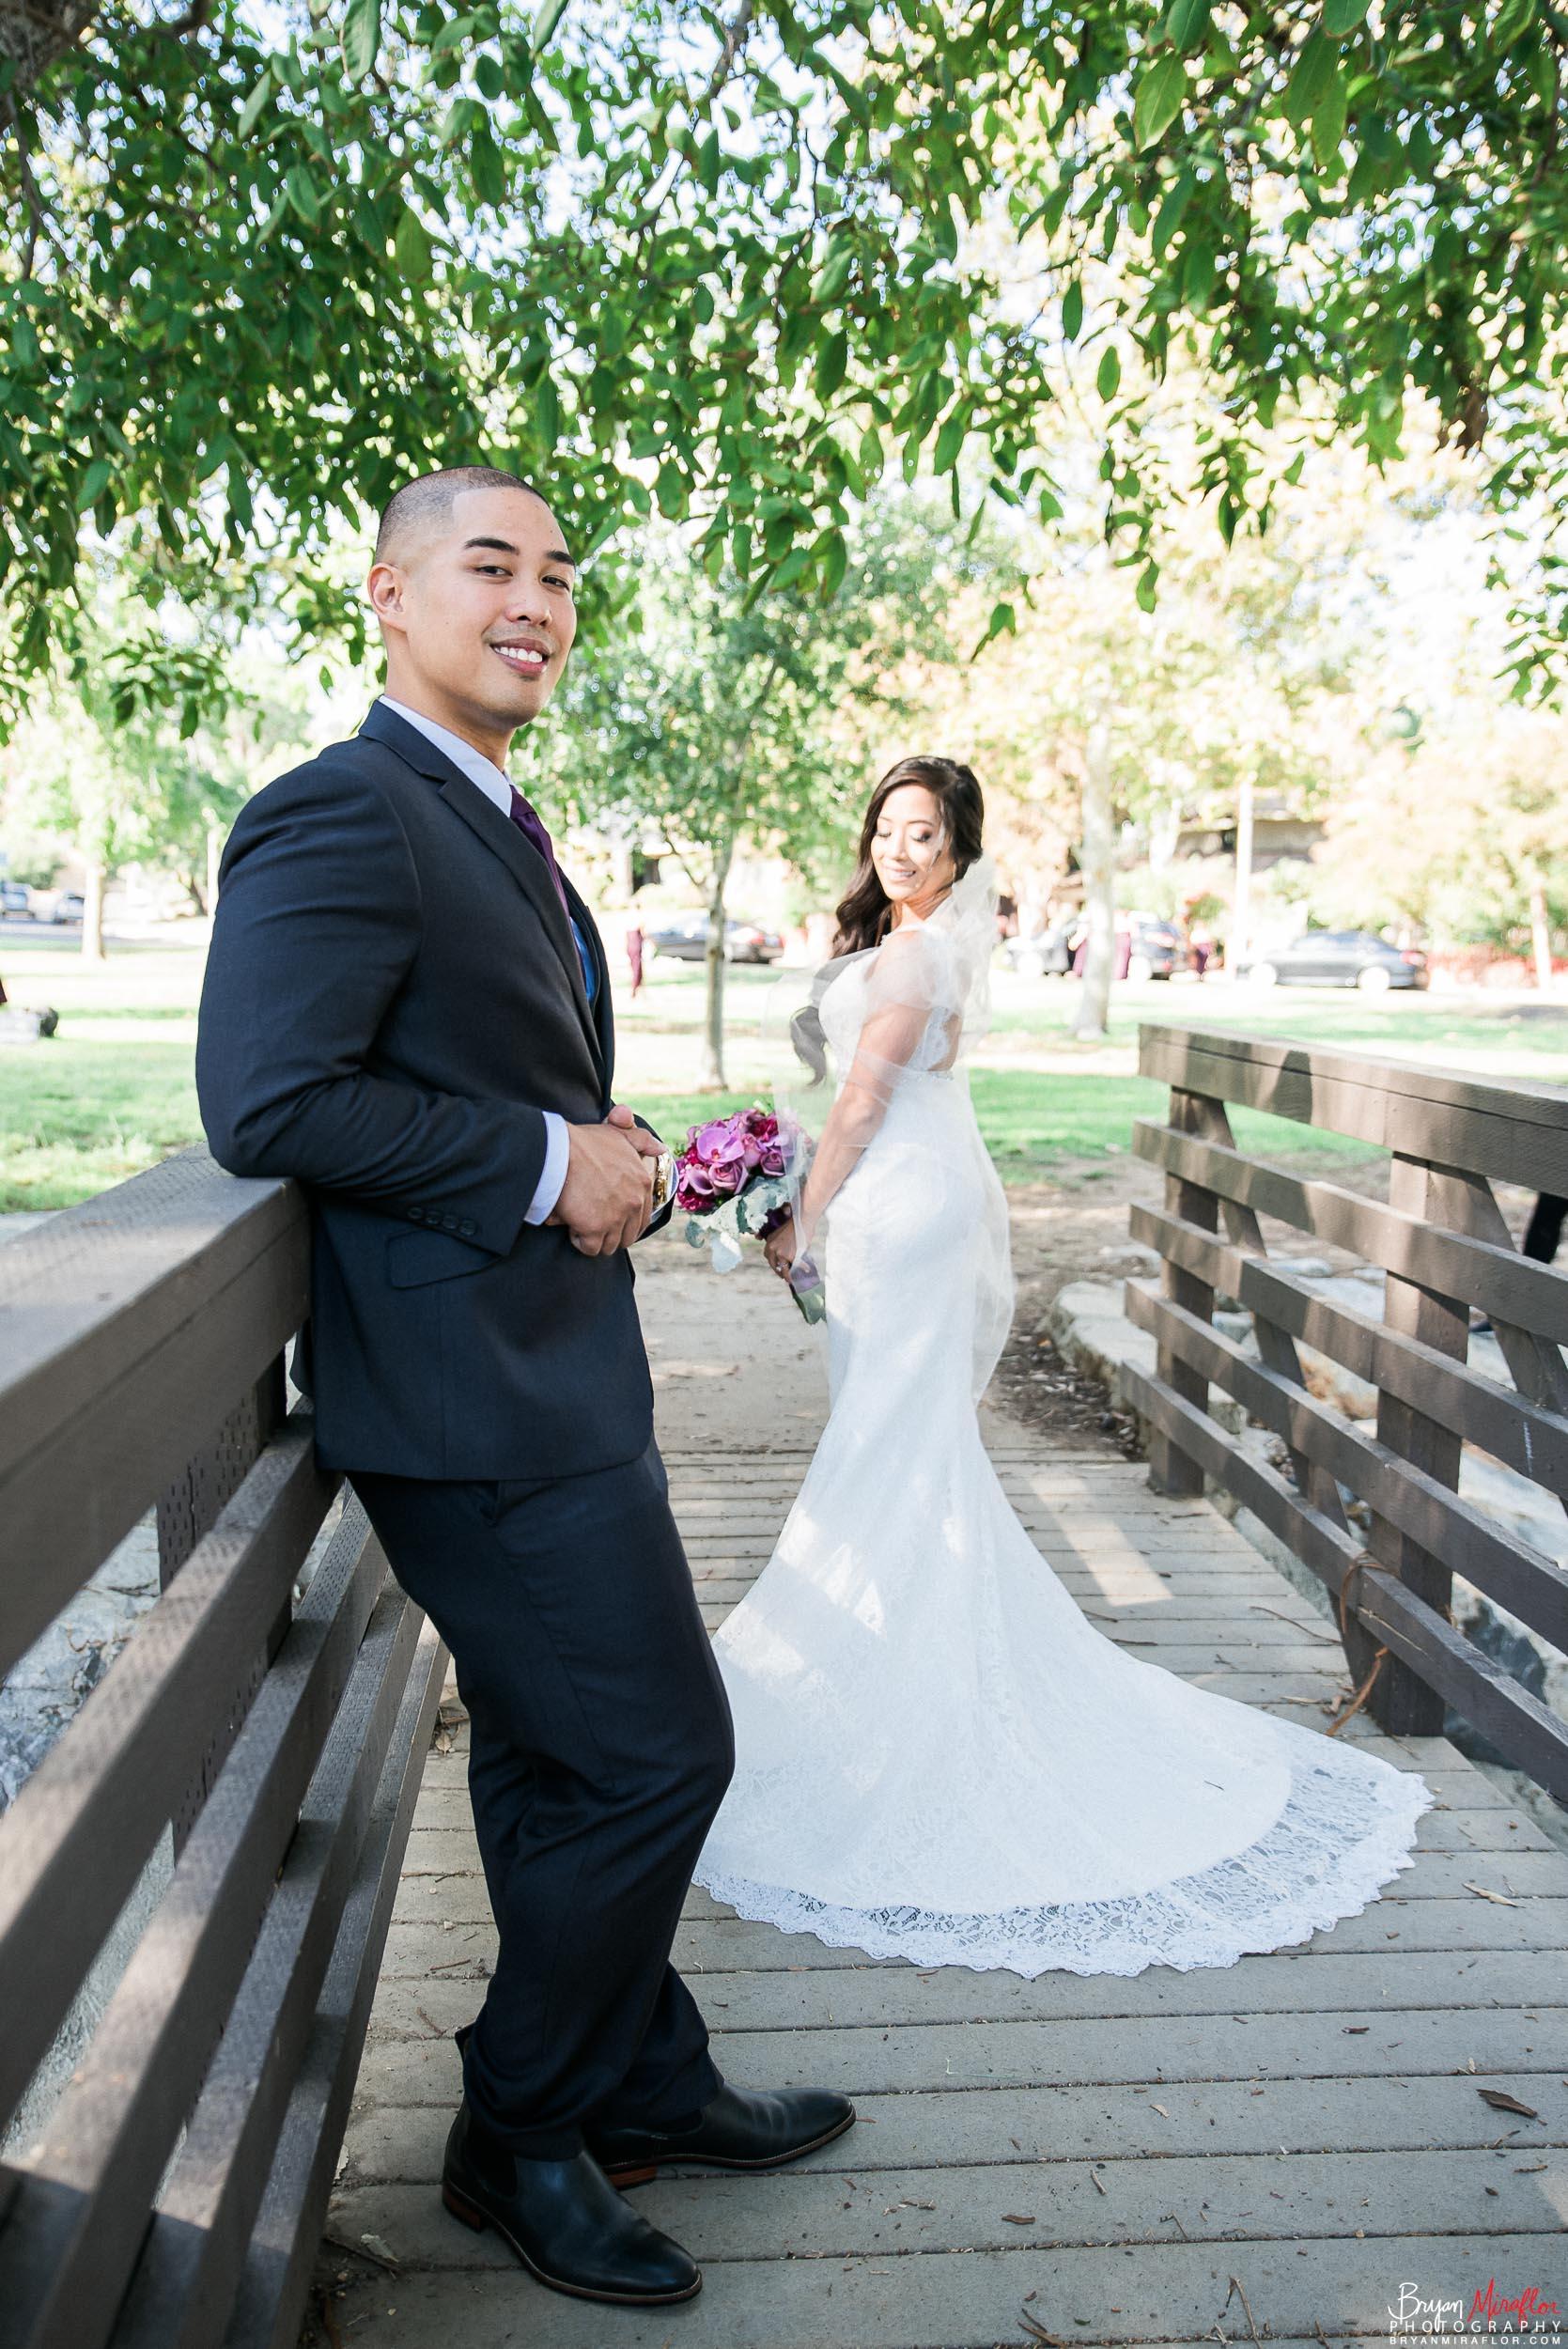 Bryan-Miraflor-Photography-Trisha-Dexter-Married-20170923-041.jpg